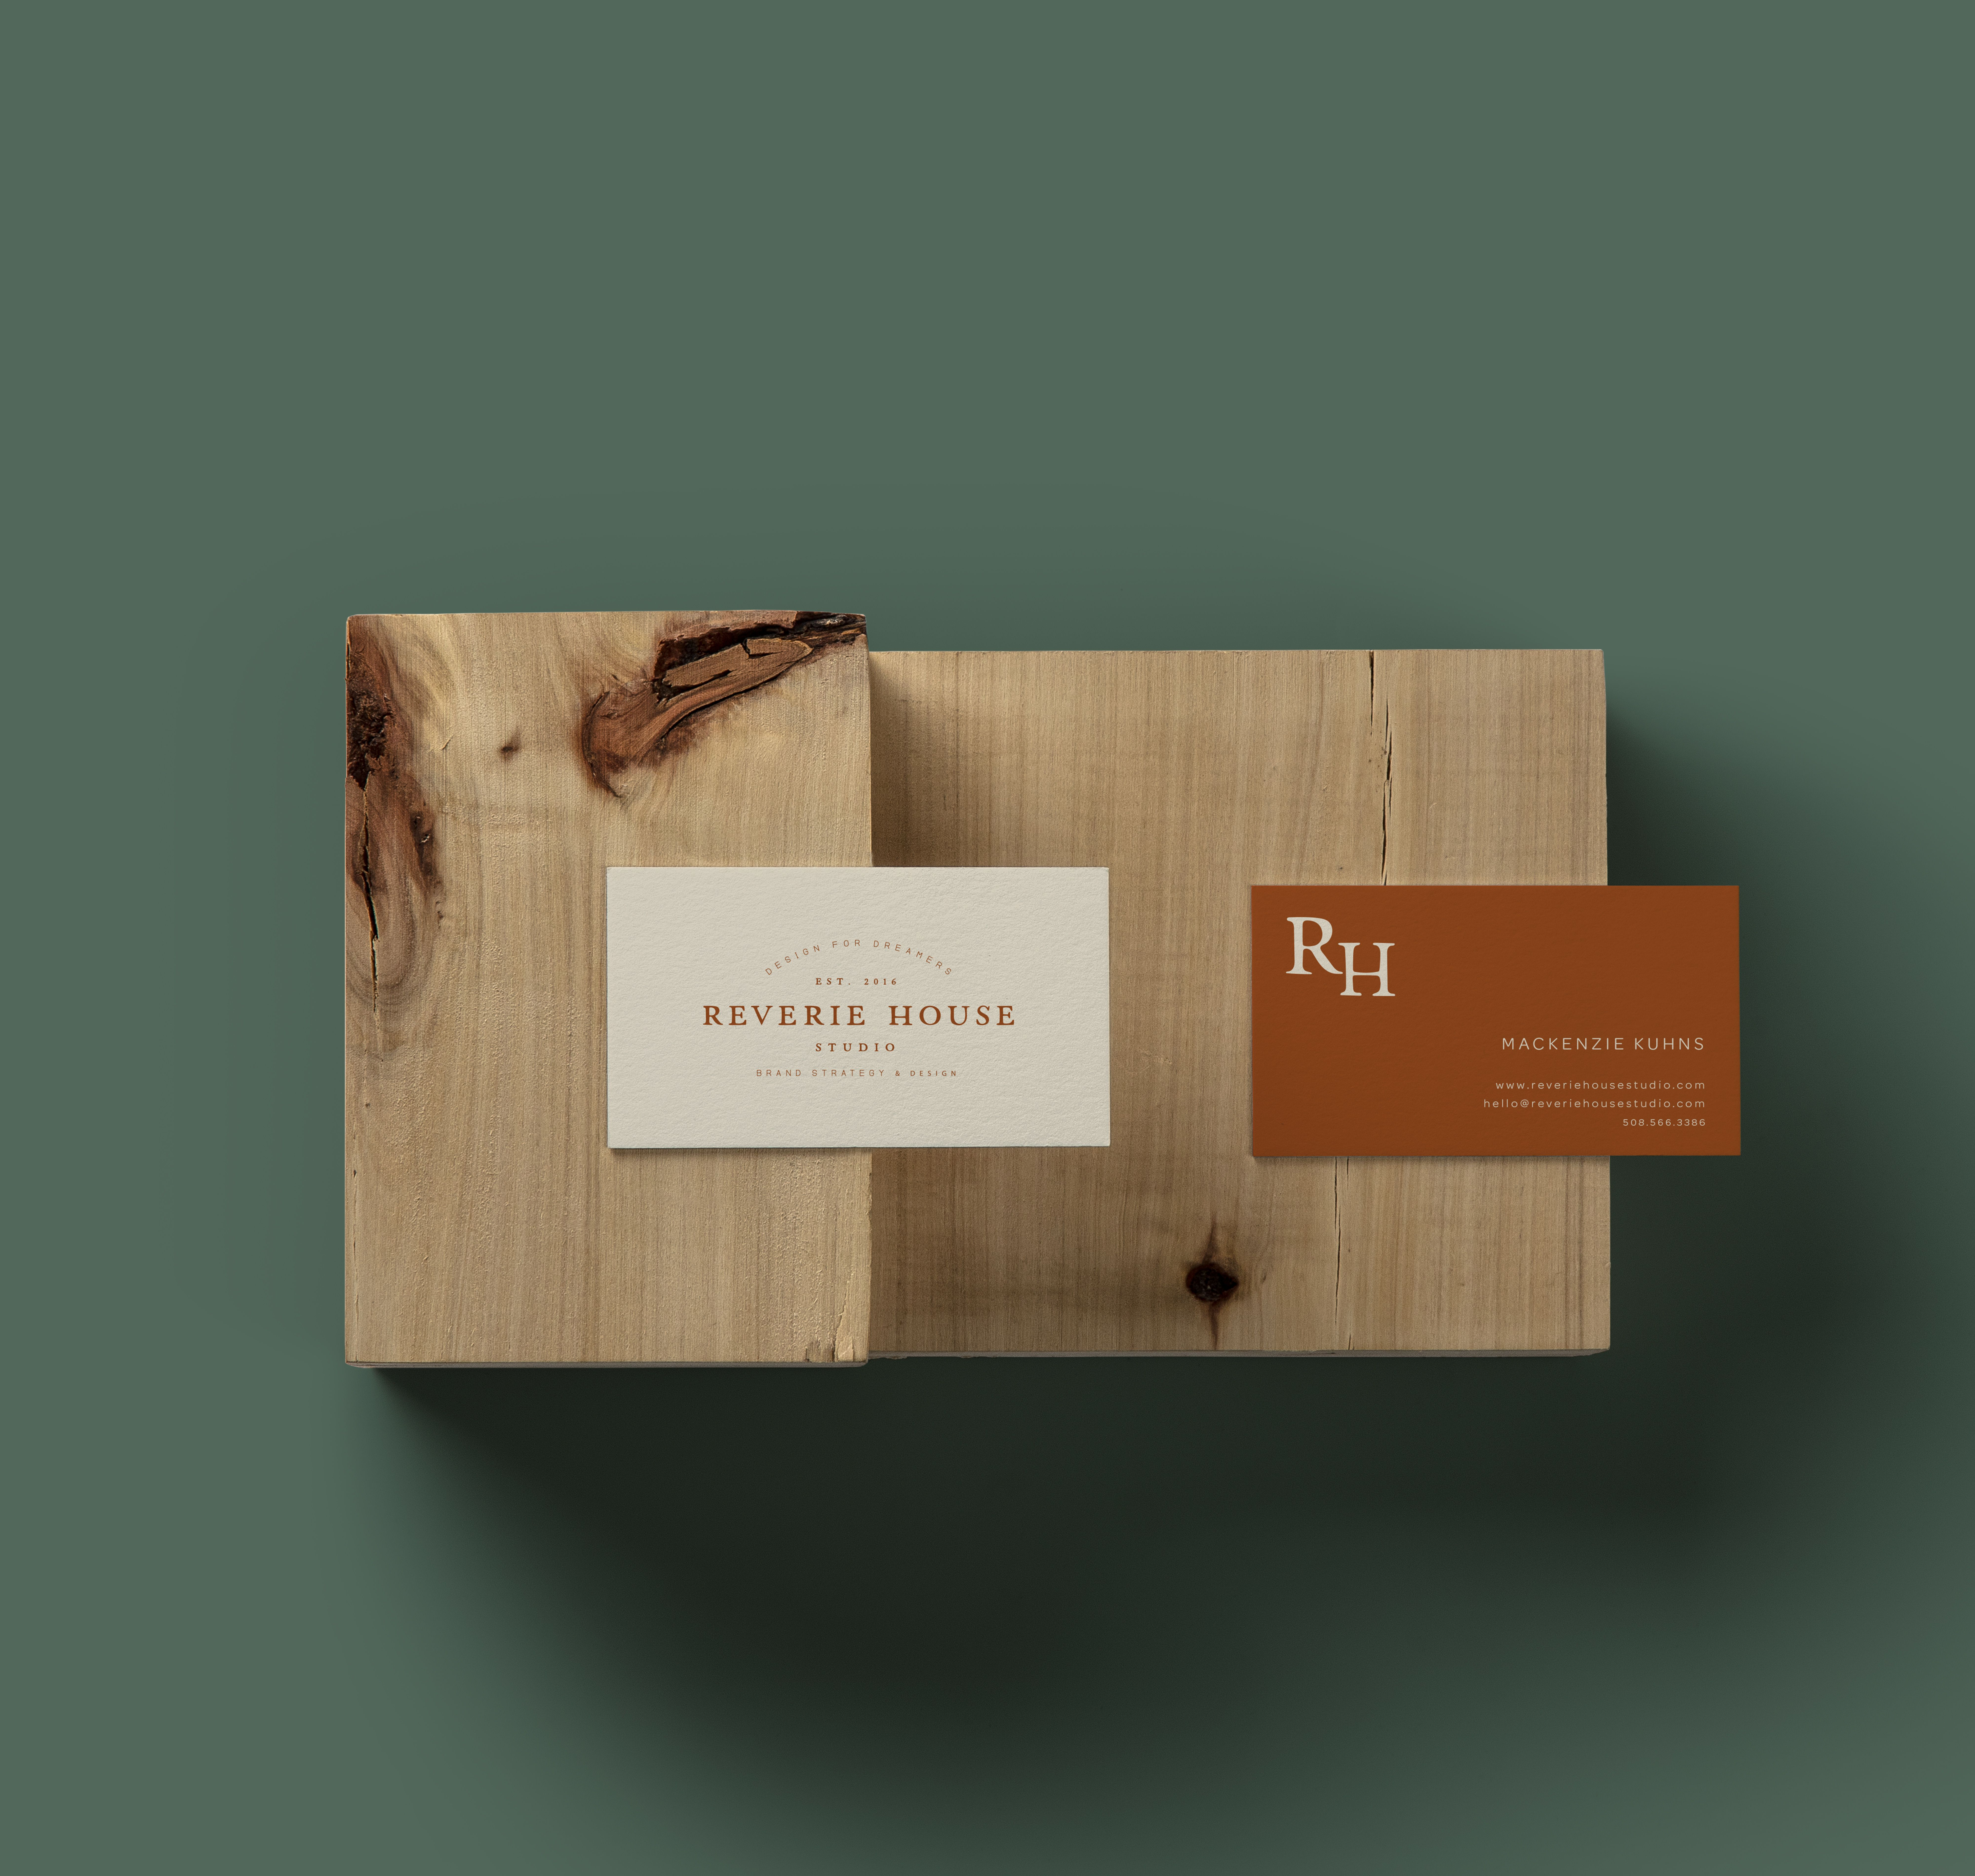 Pin By Reverie House Studio On Design Brand Identity Pinterest